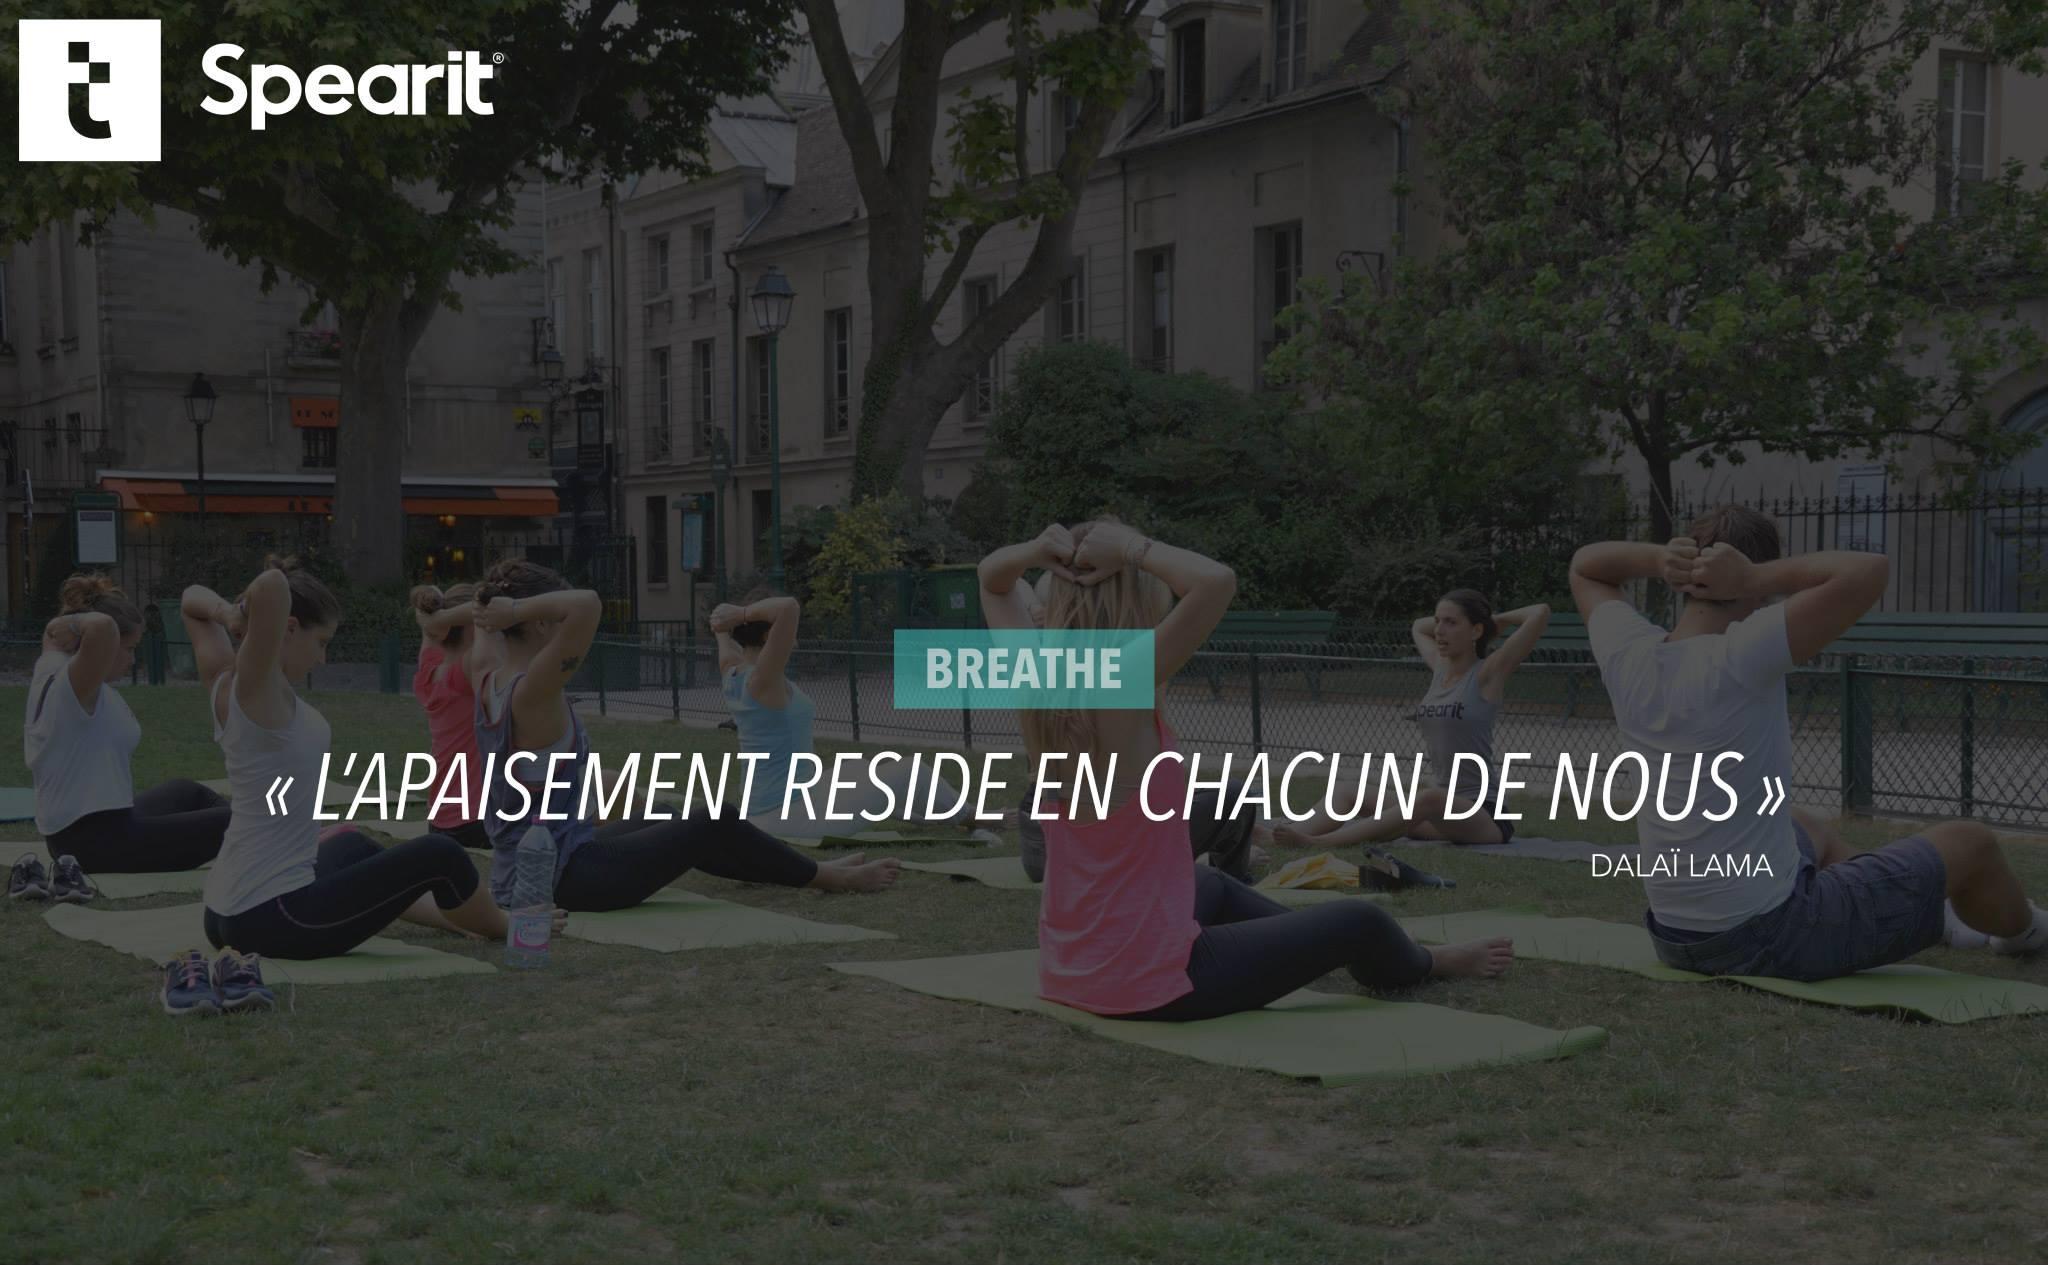 yogaspearit